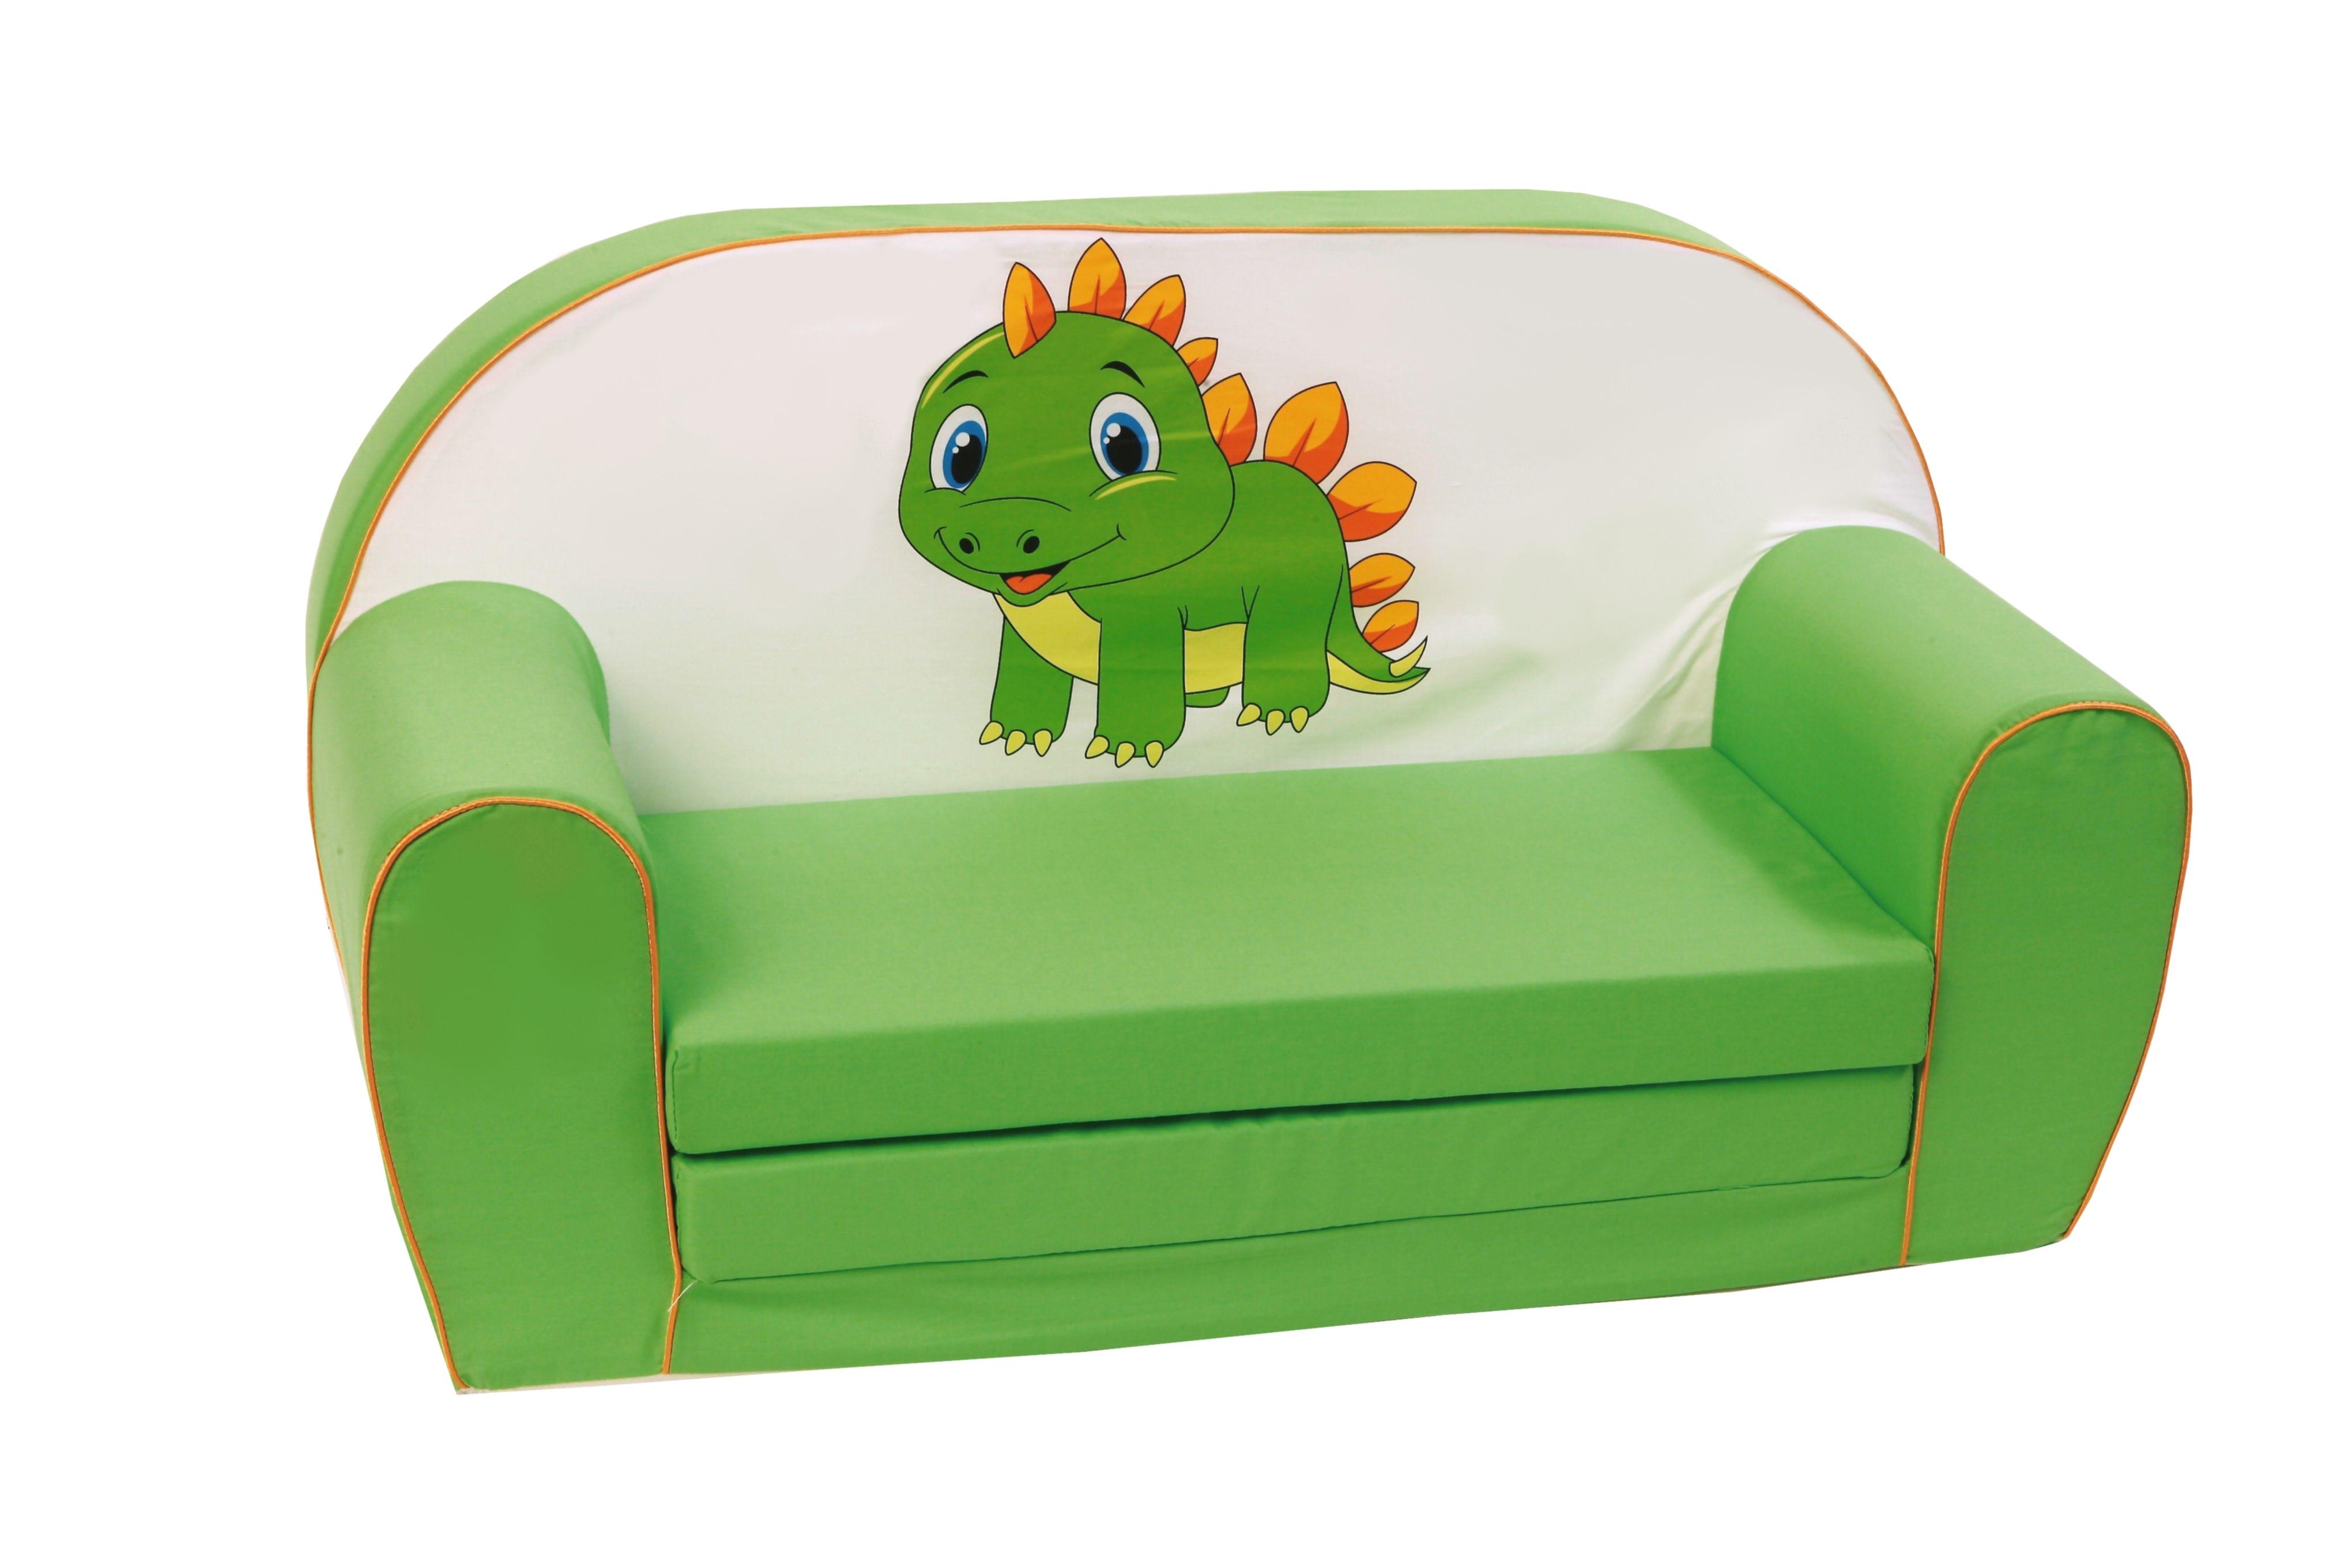 kinderzimmer sofa hausgestaltung ideen. Black Bedroom Furniture Sets. Home Design Ideas